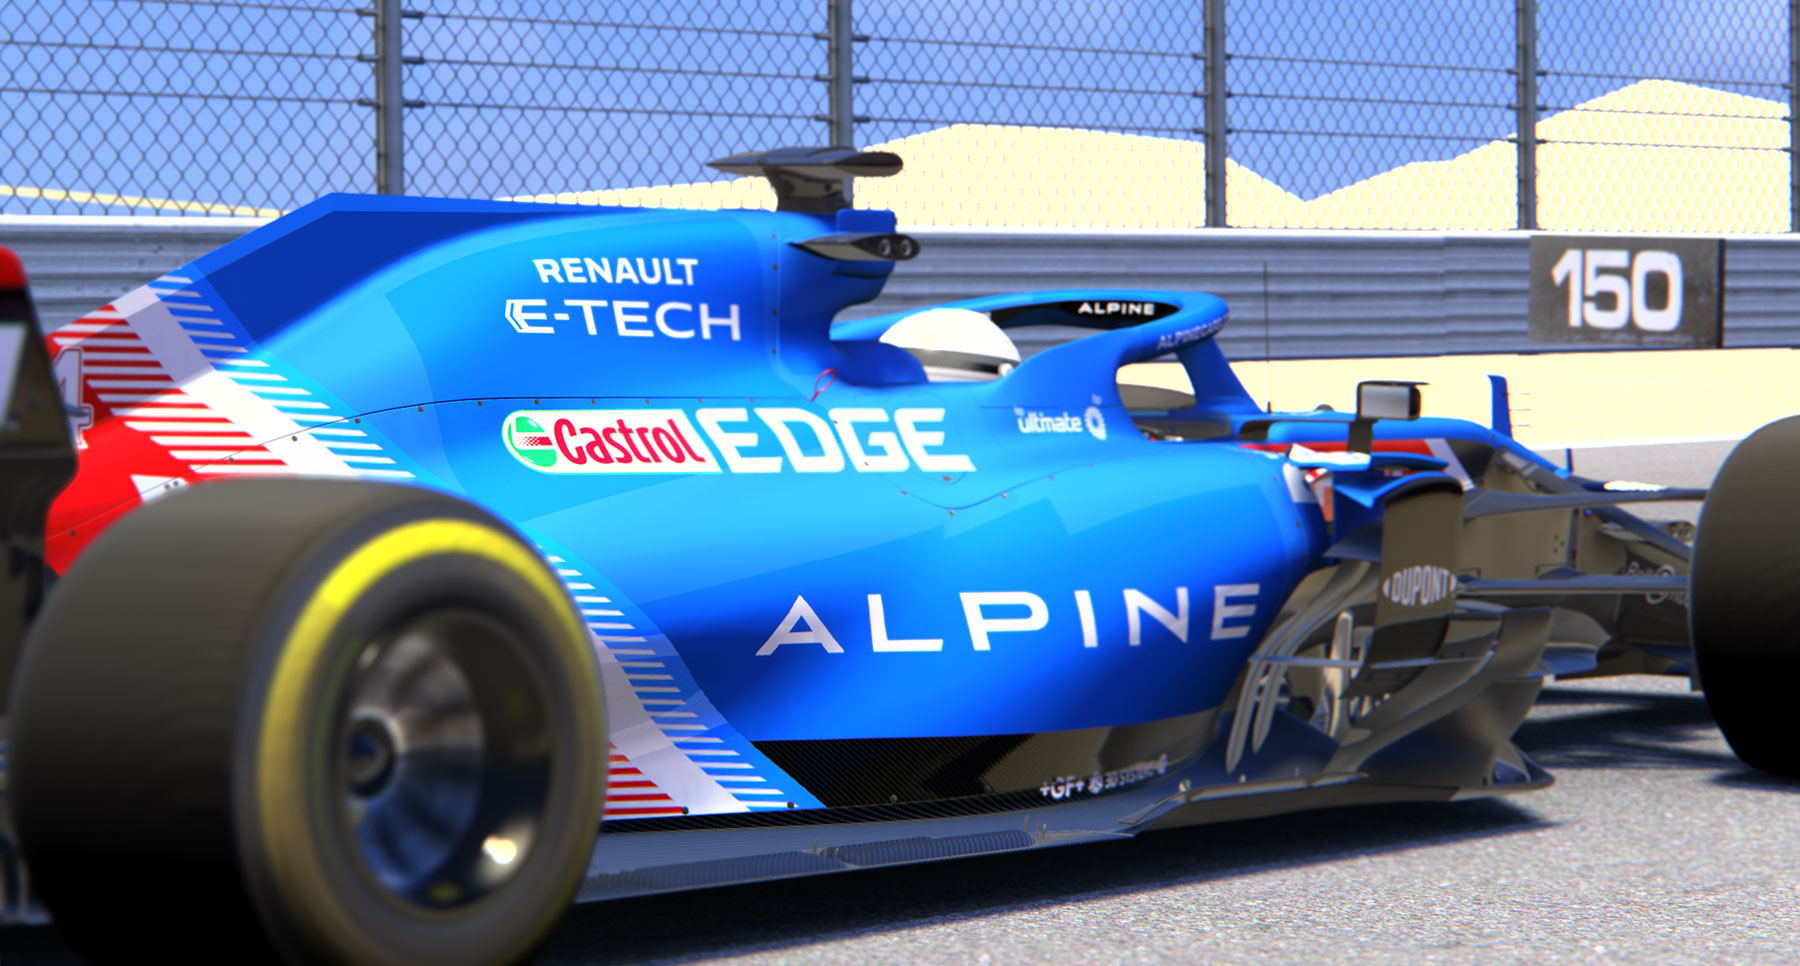 Alpine-2.jpg